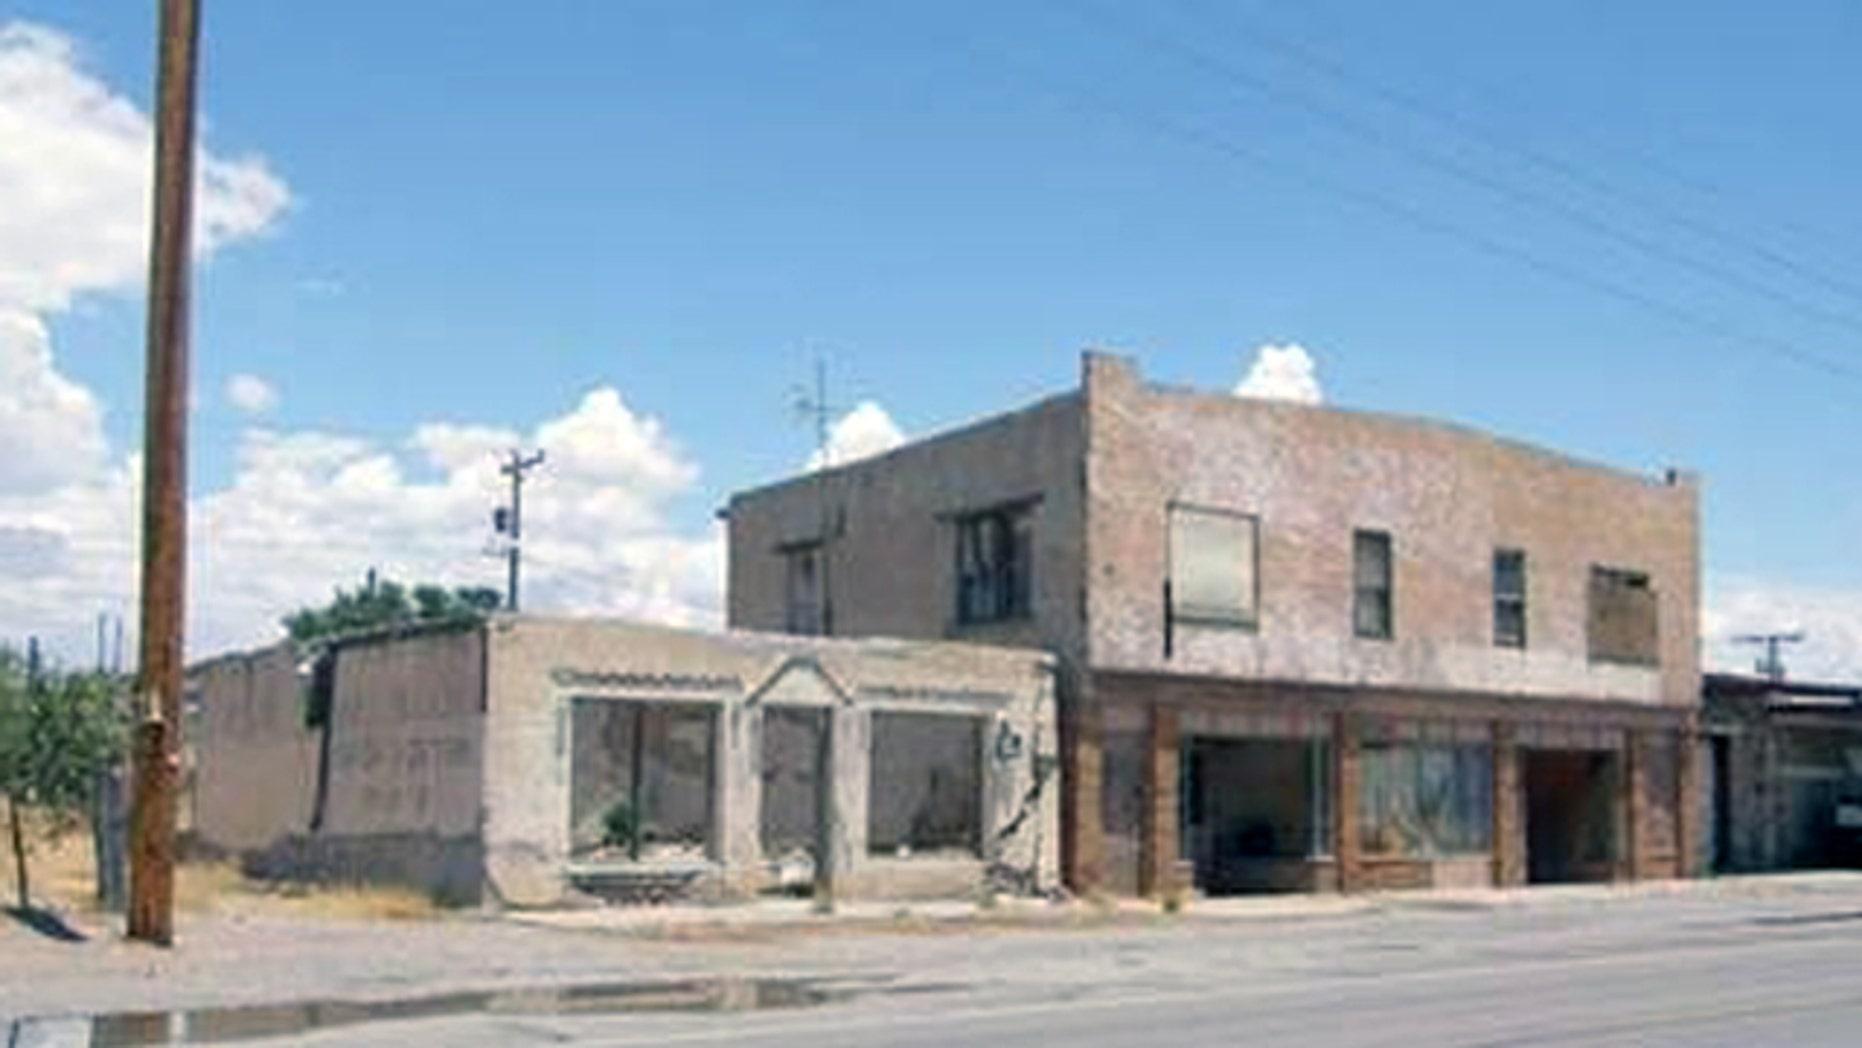 Downtown Fort Hancock, Texas